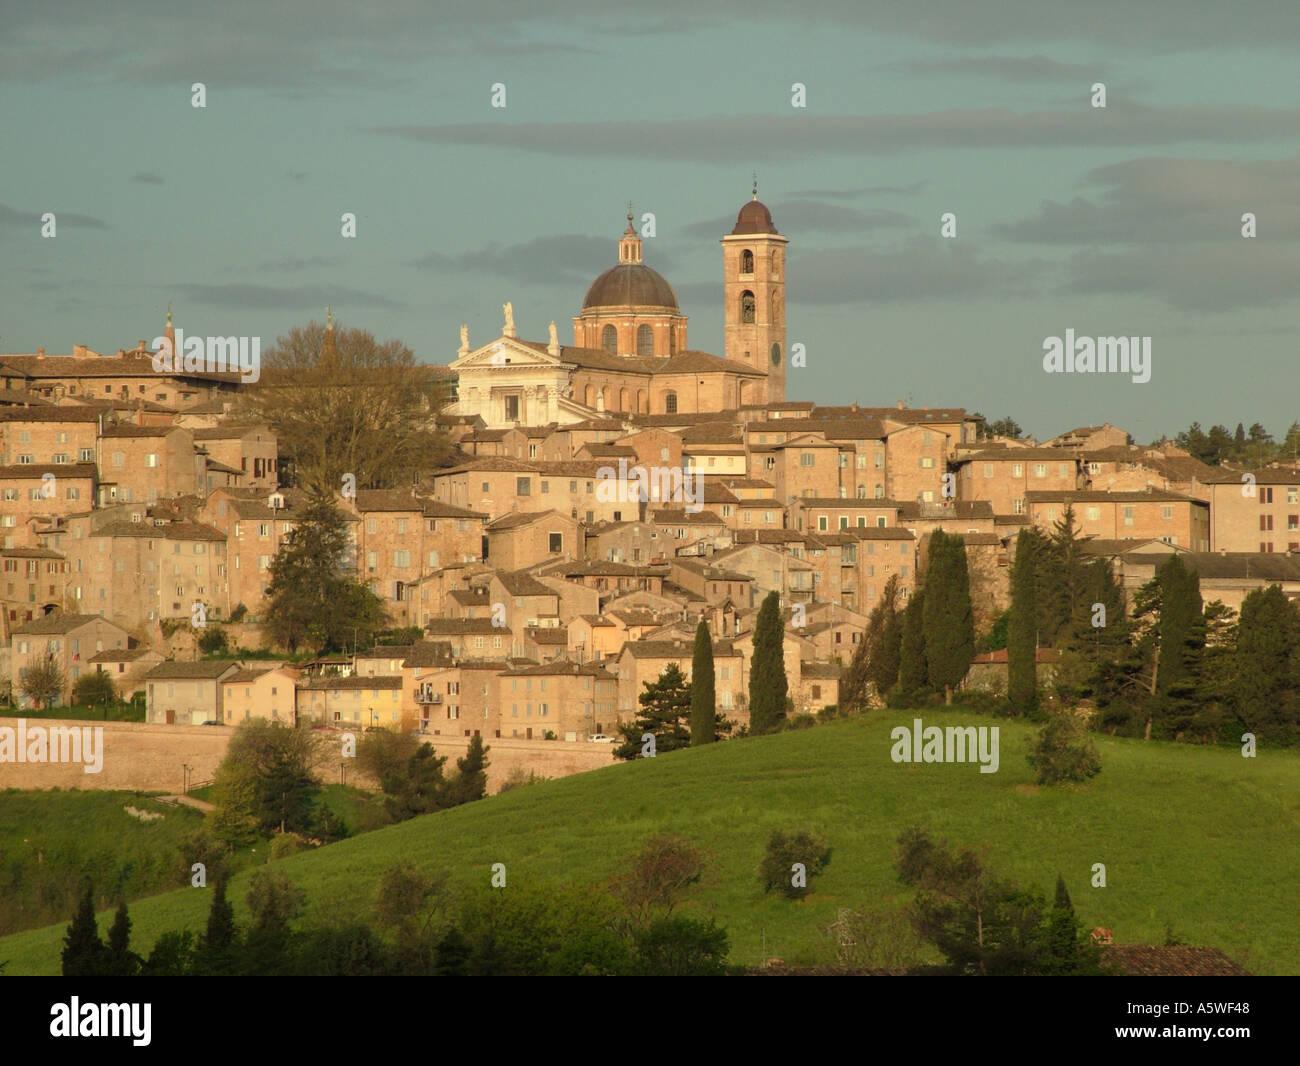 AJD36512, Marche, Italy, Urbino, Europe - Stock Image